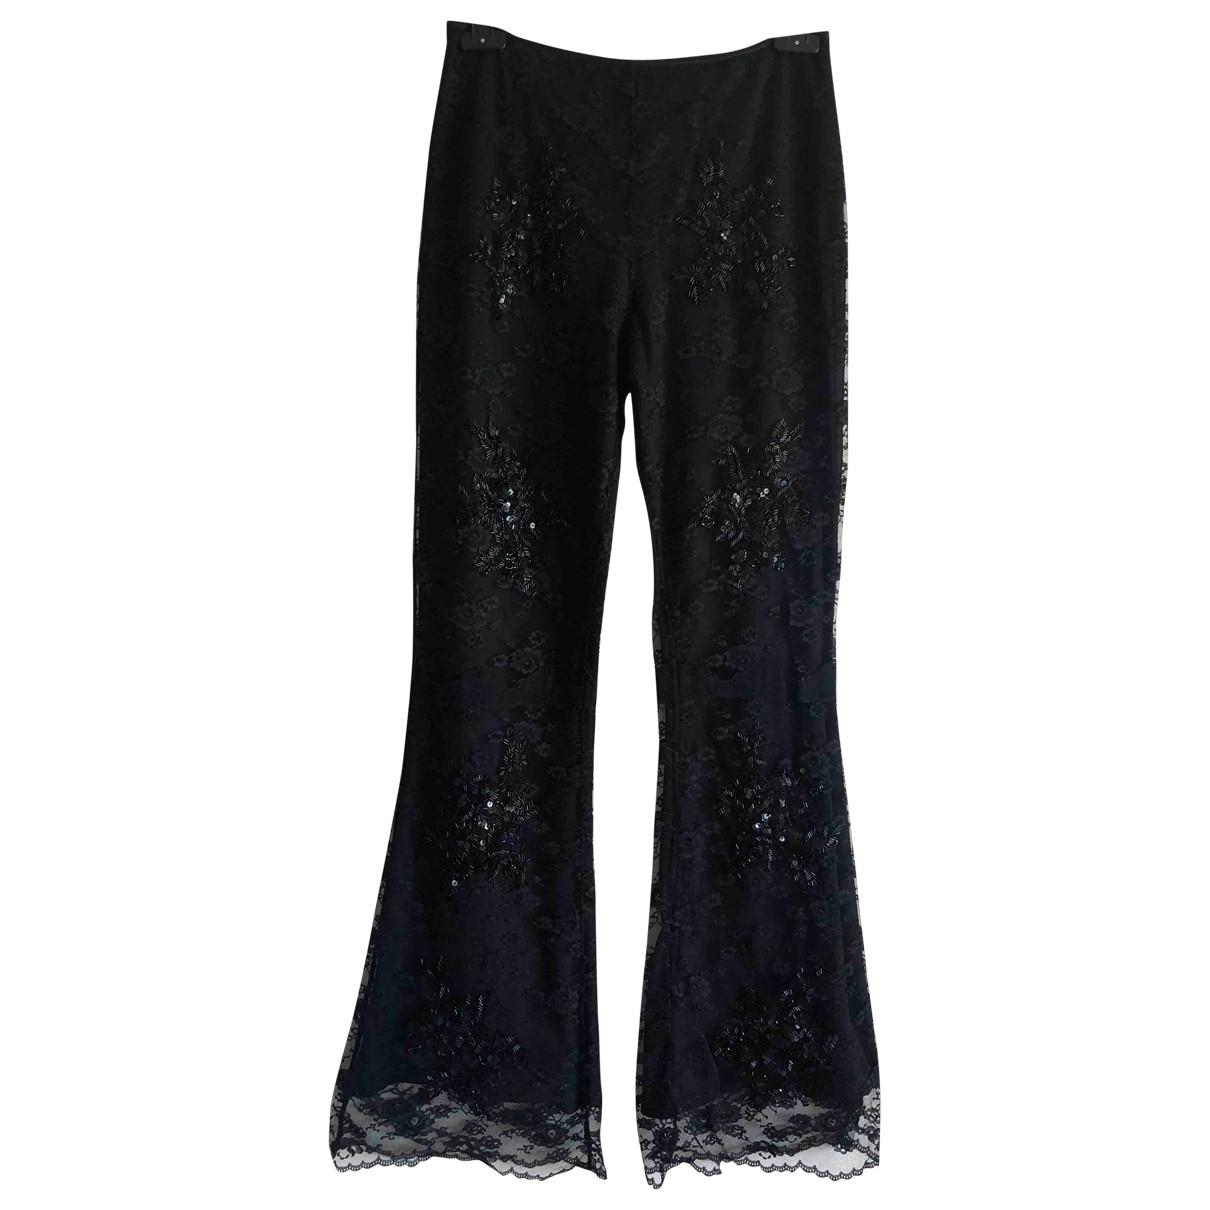 Karen Millen \N Black Trousers for Women 10 UK